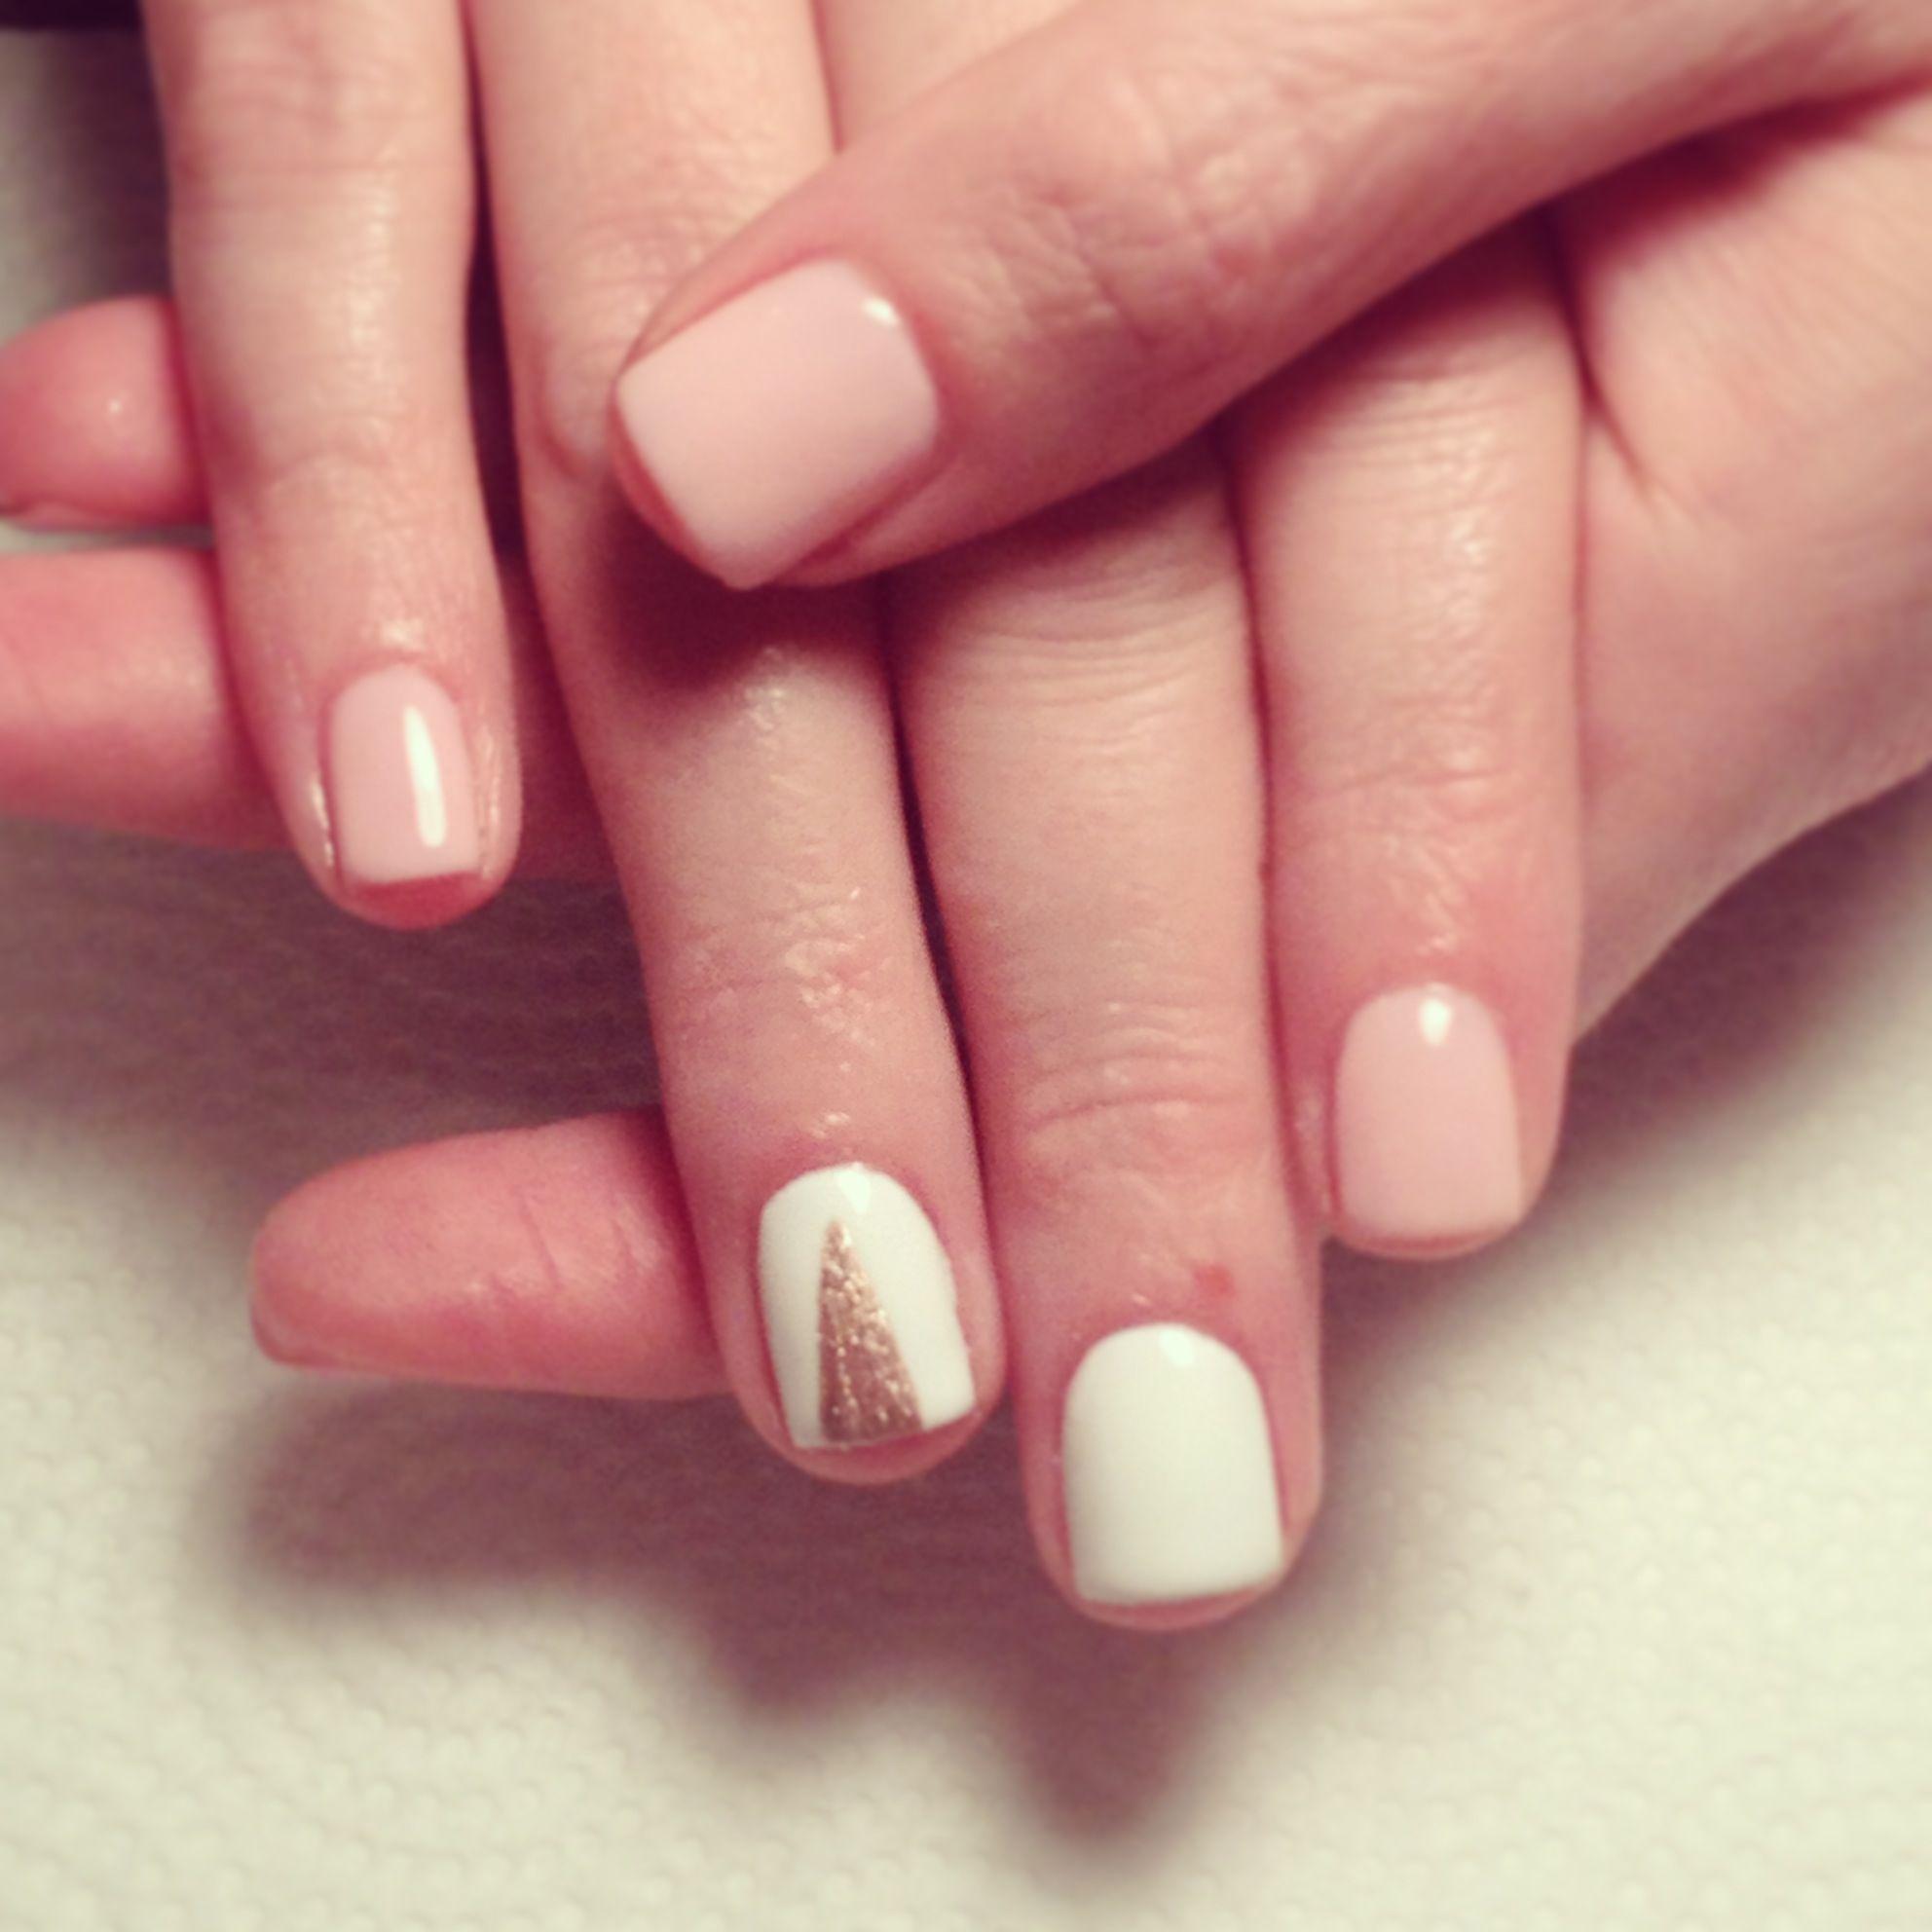 Nails by Karli